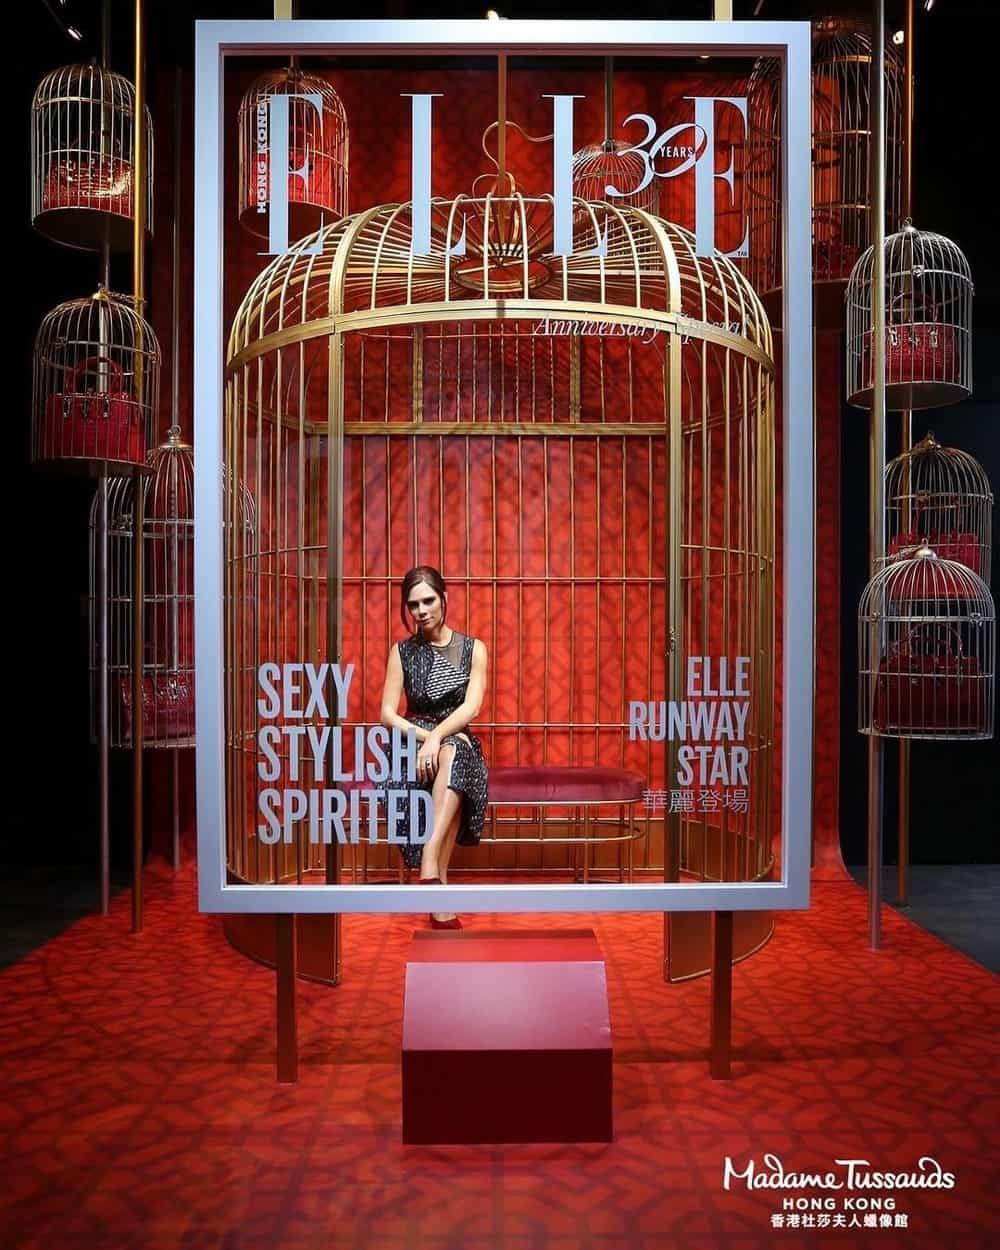 5 Alasan Anda Wajib Pergi Ke Madame Tussauds Hong Kong